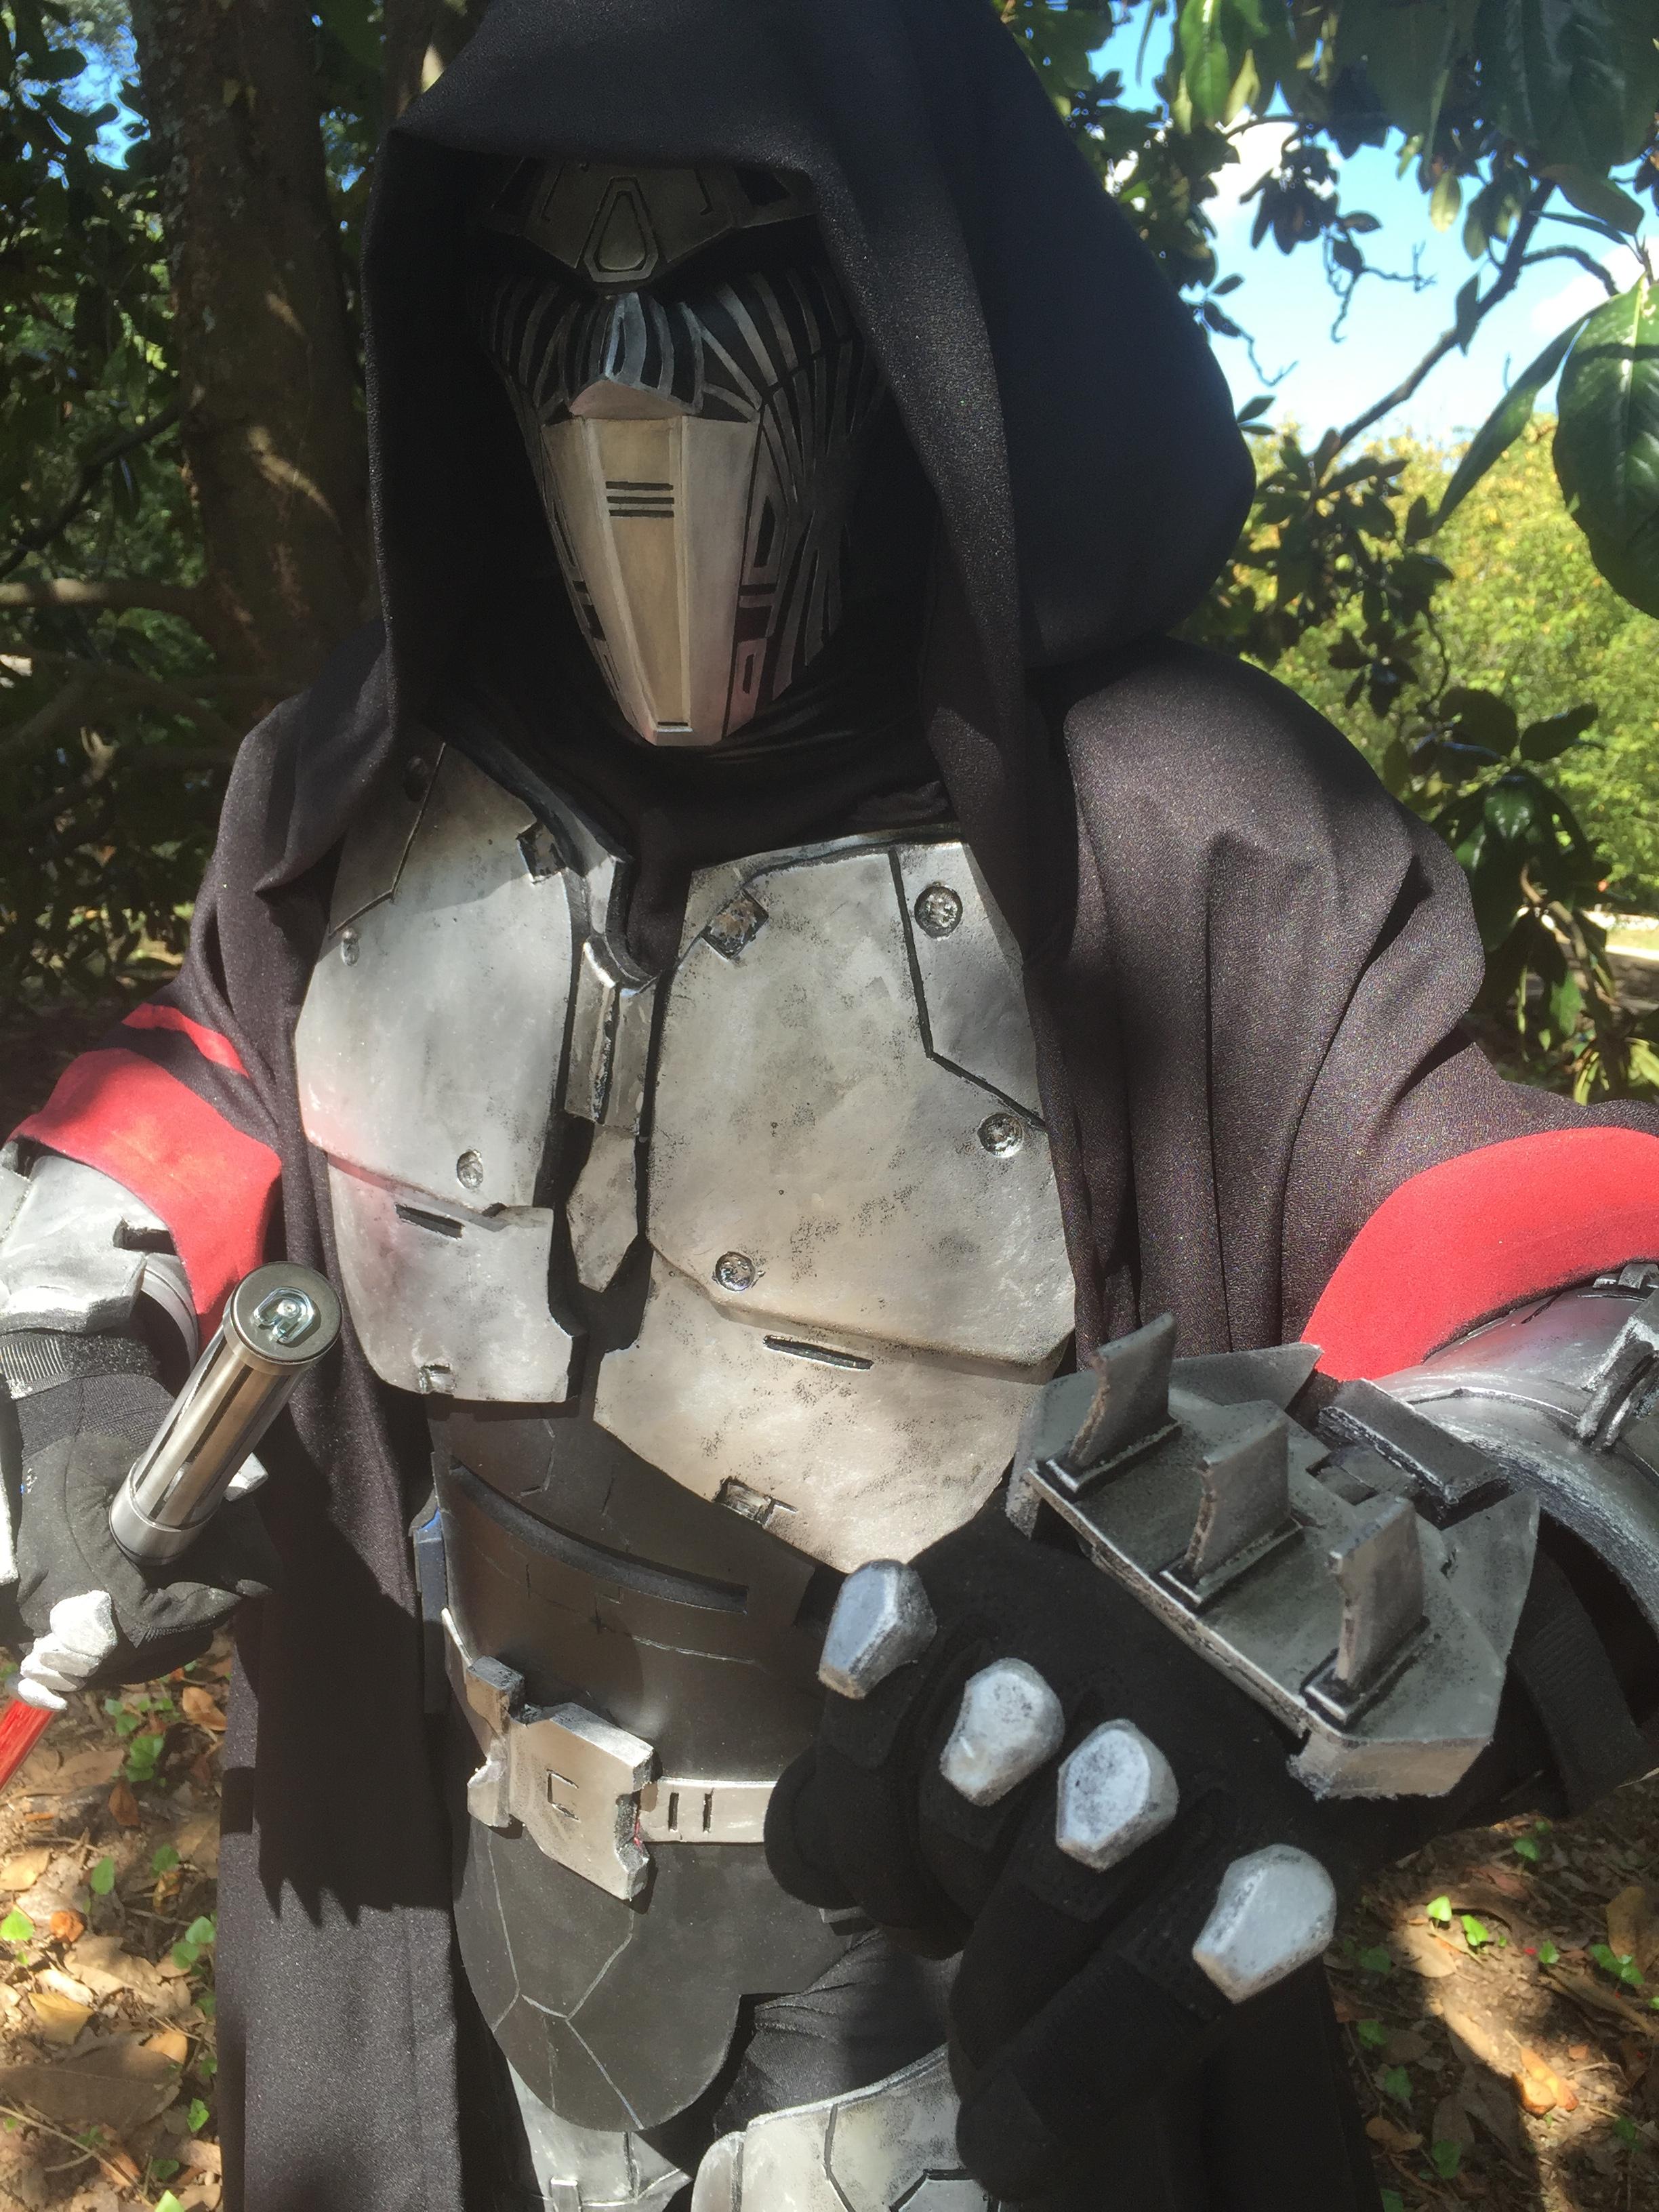 Sith Acolyte Eradicator Costume